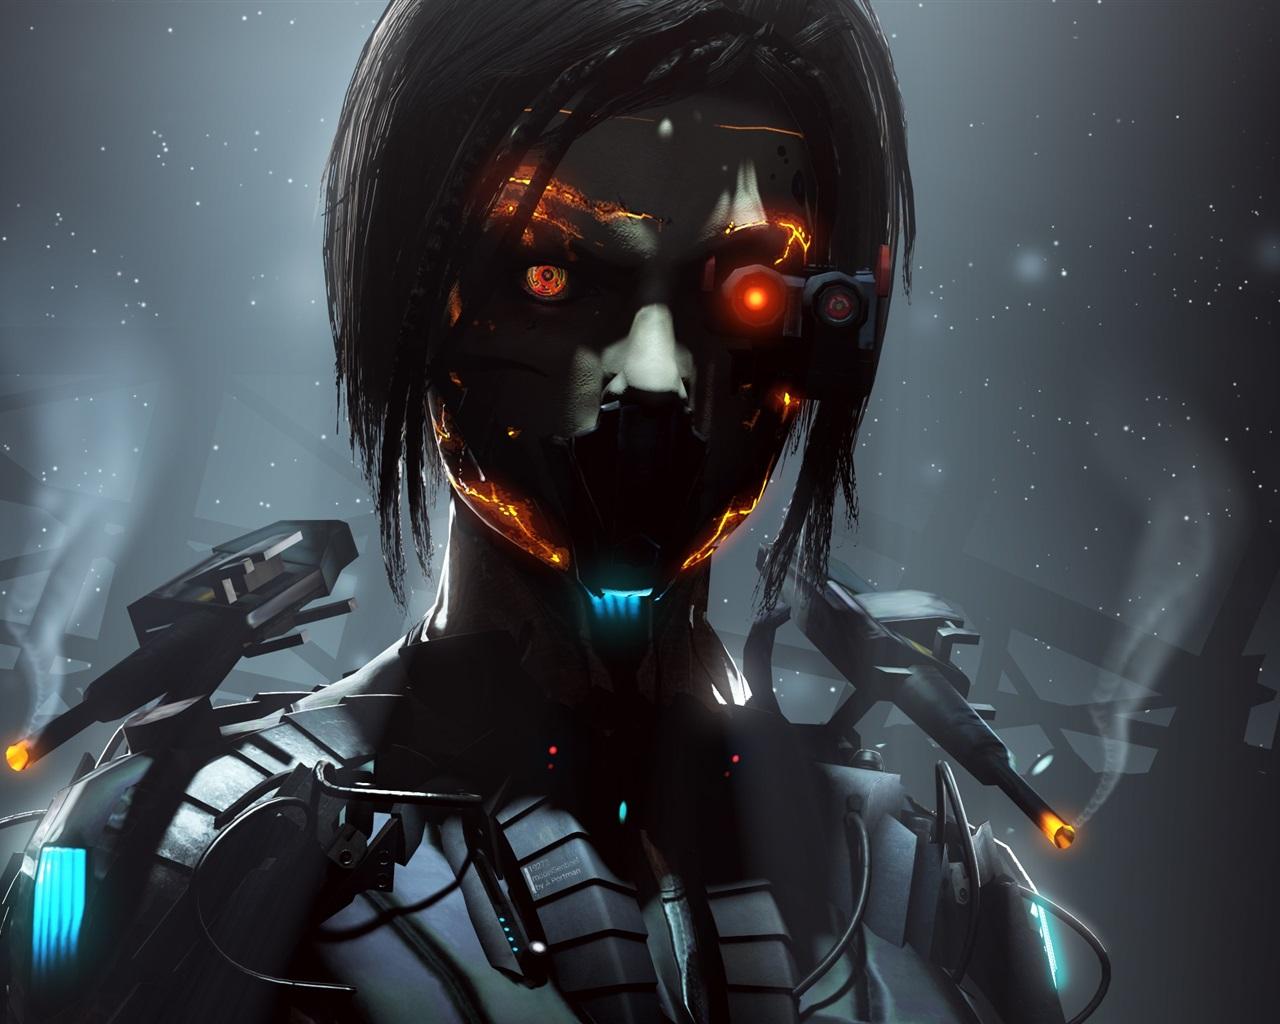 Wallpaper Cyborg Robot Girl Fantasy Creative Pictures